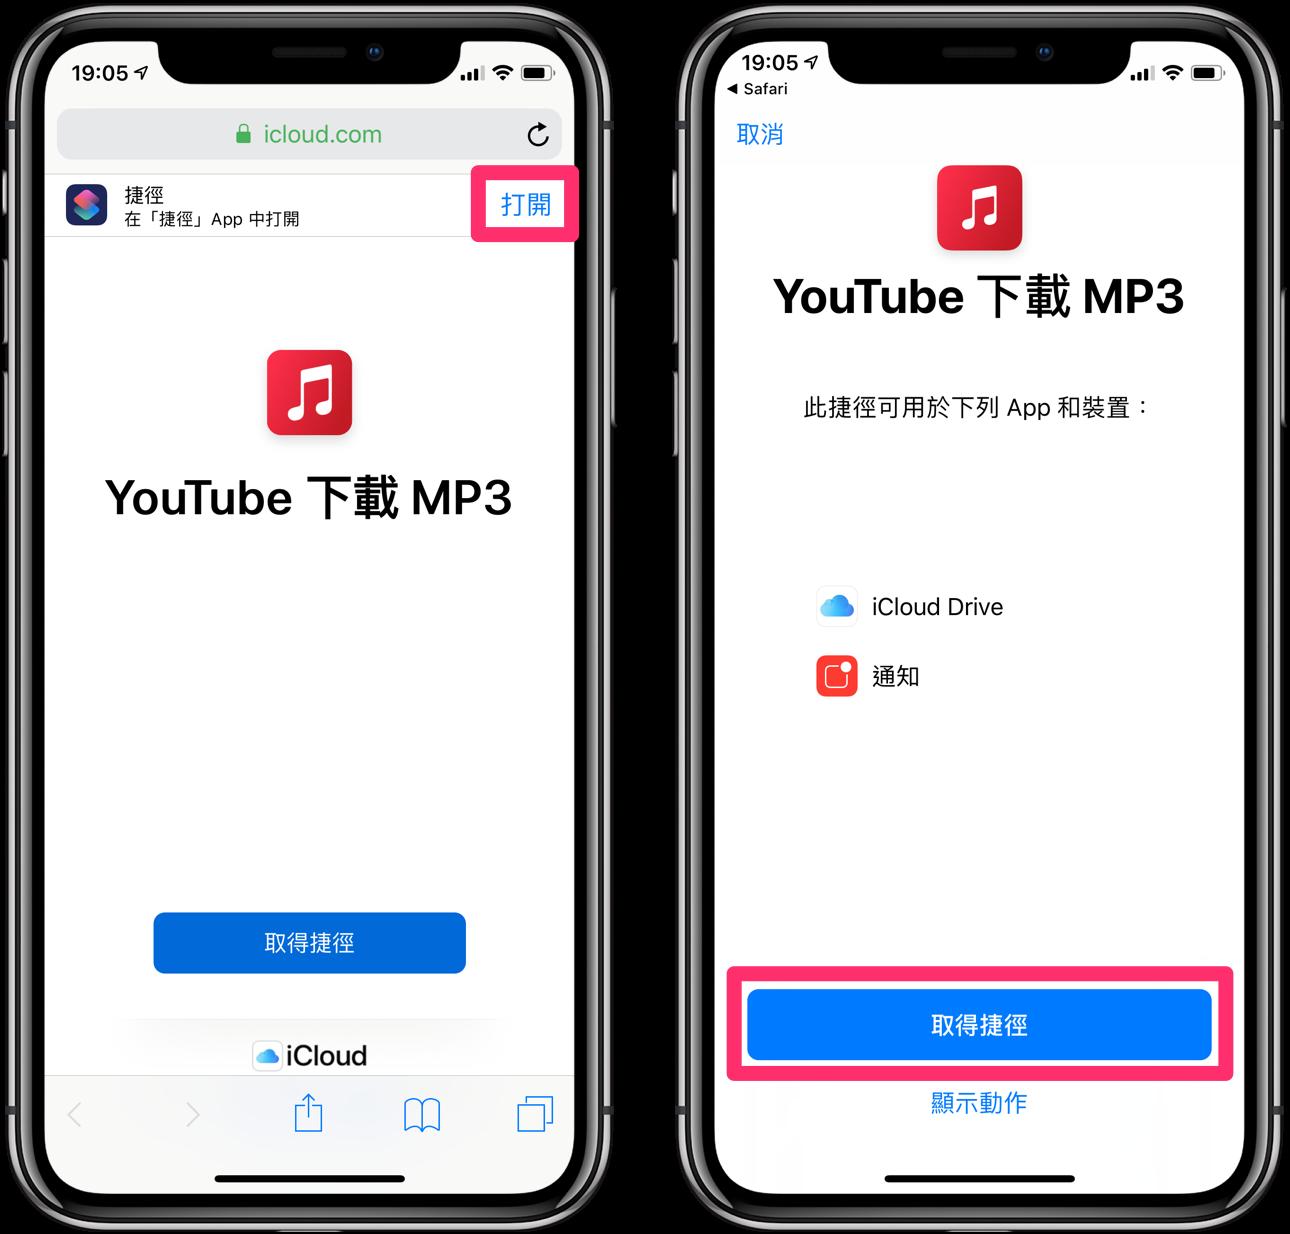 YouTube 下載 MP3